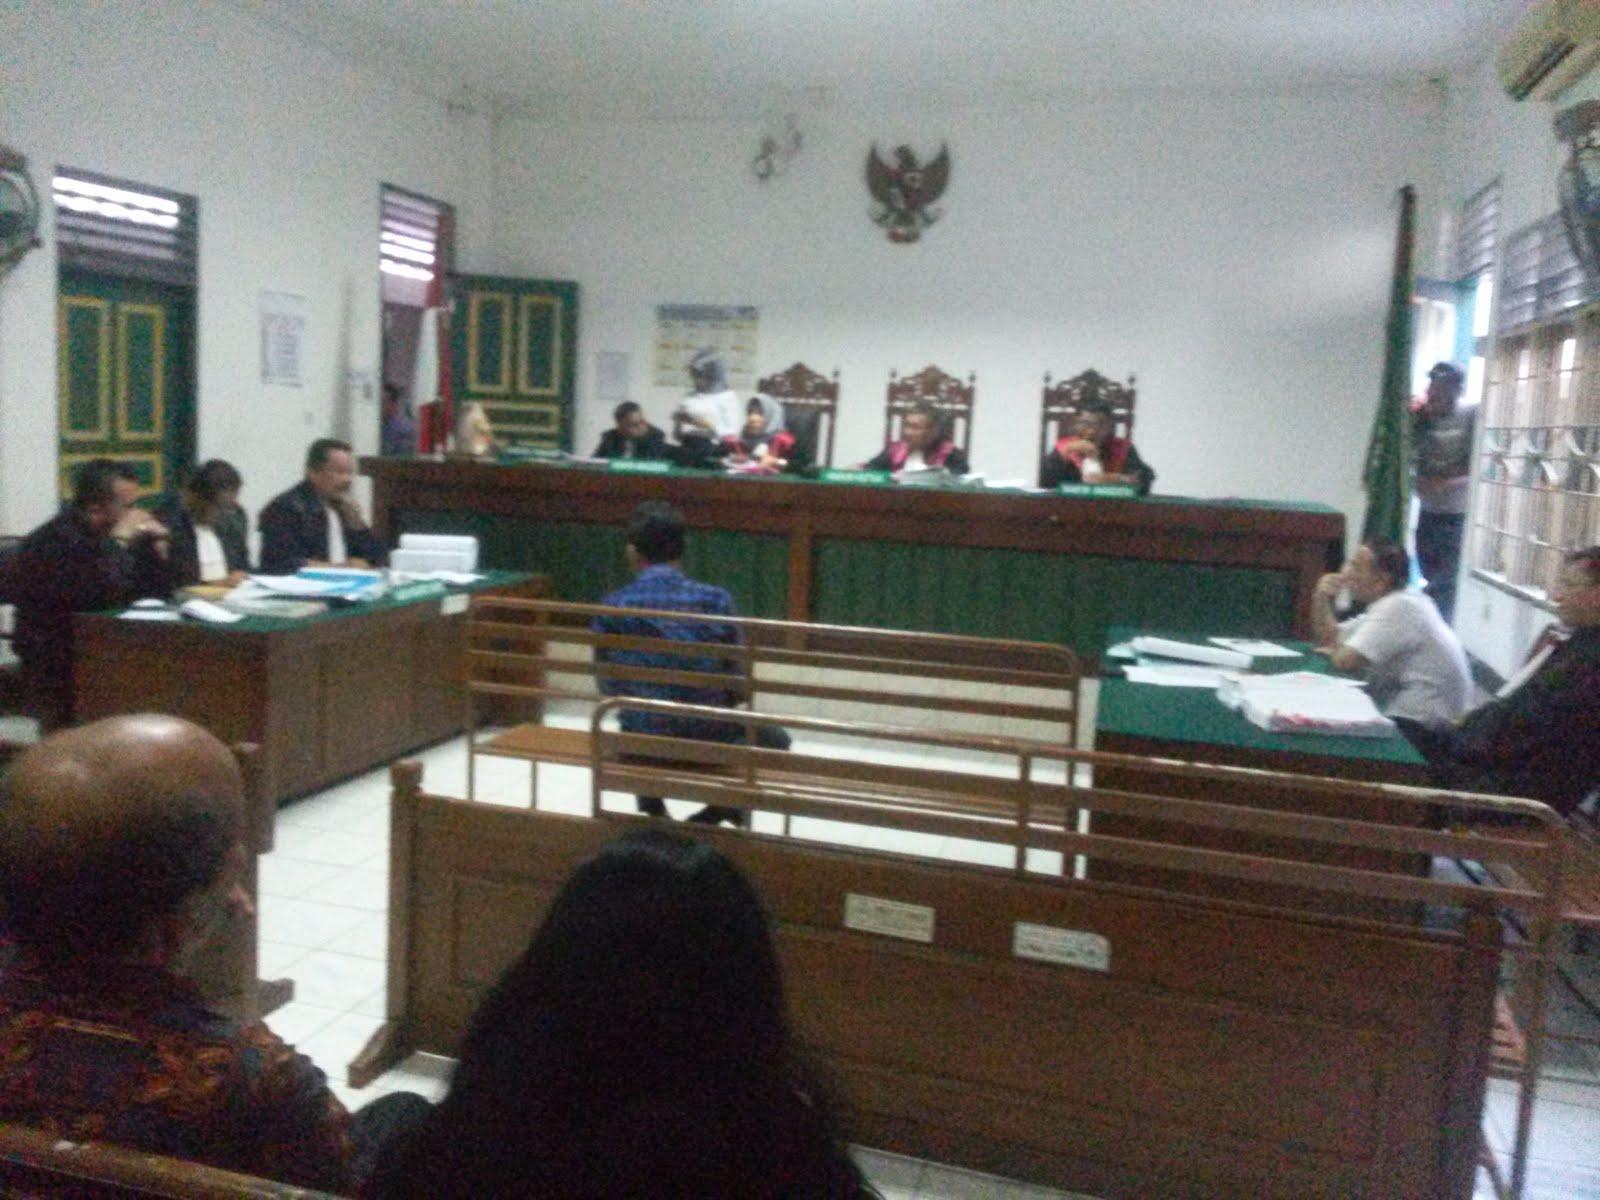 Perjanjian Kontrak Diteken 2007 Perda Penyertaan Modal Ke Pt Ral  # Muebles Coarte Manta